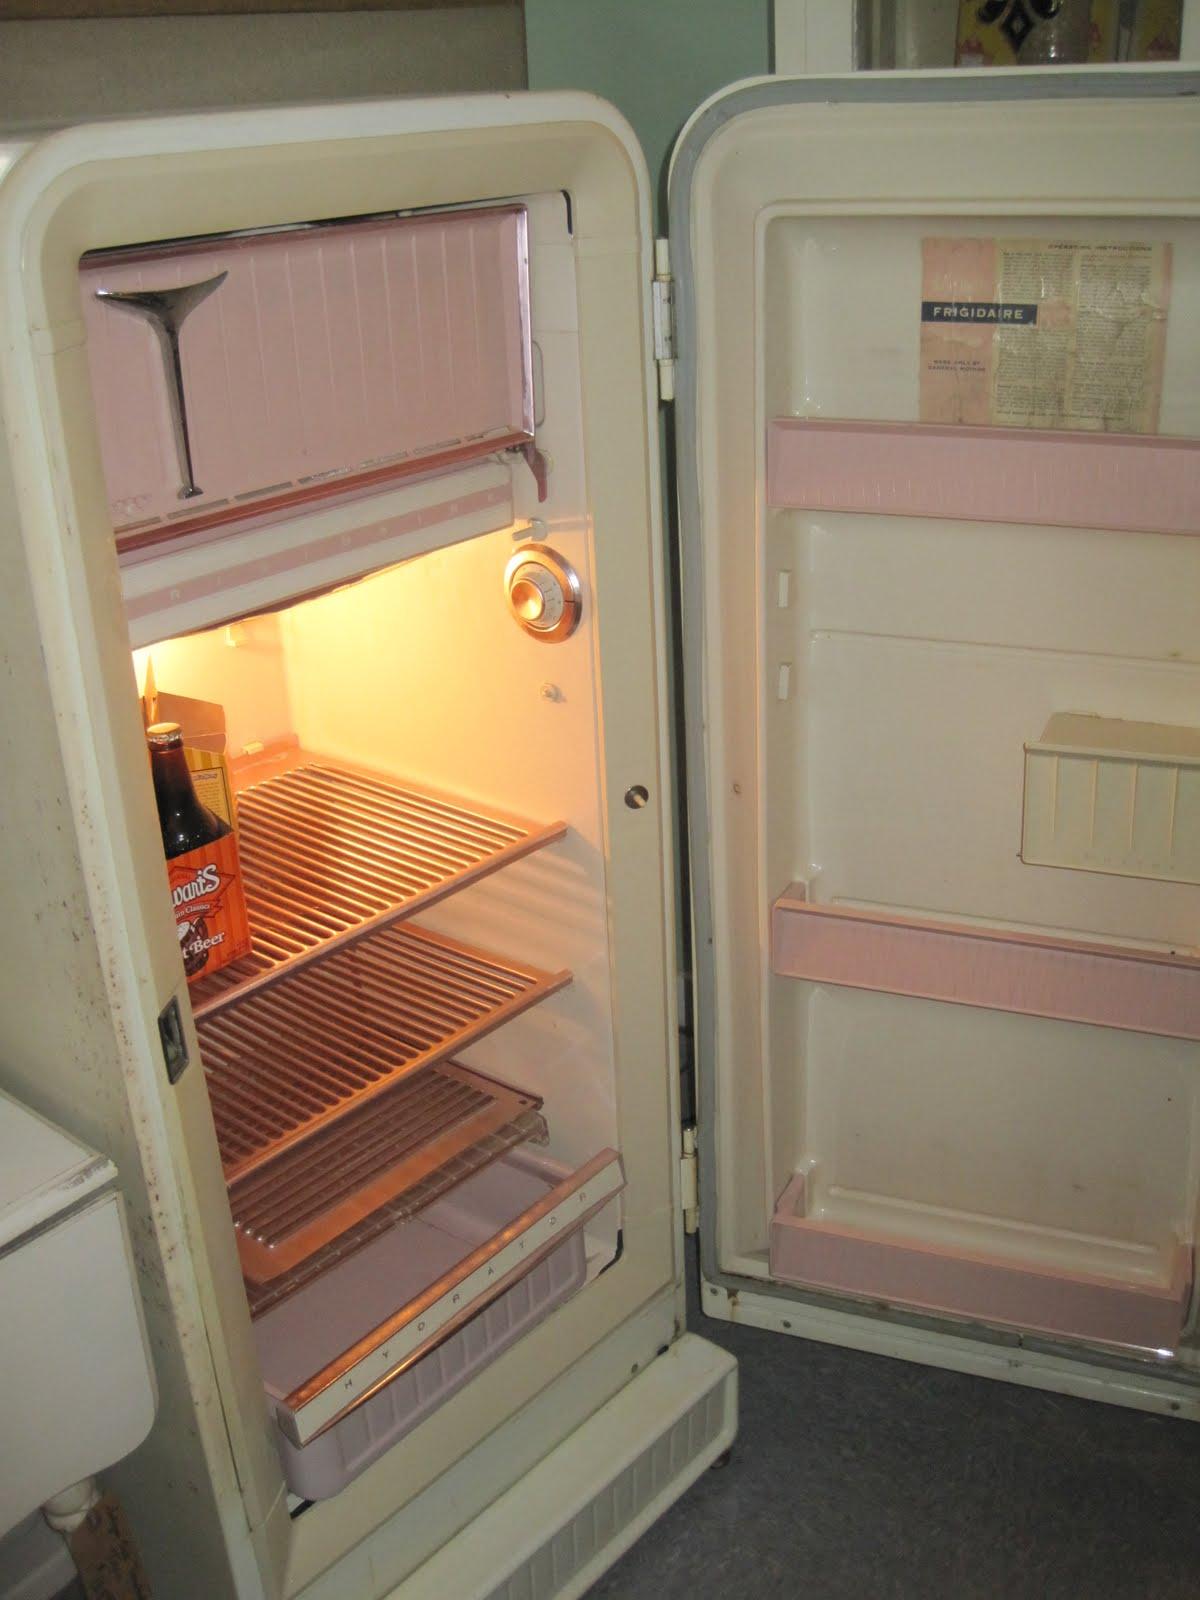 The Inside Of My Vintage Fridge Is Pink